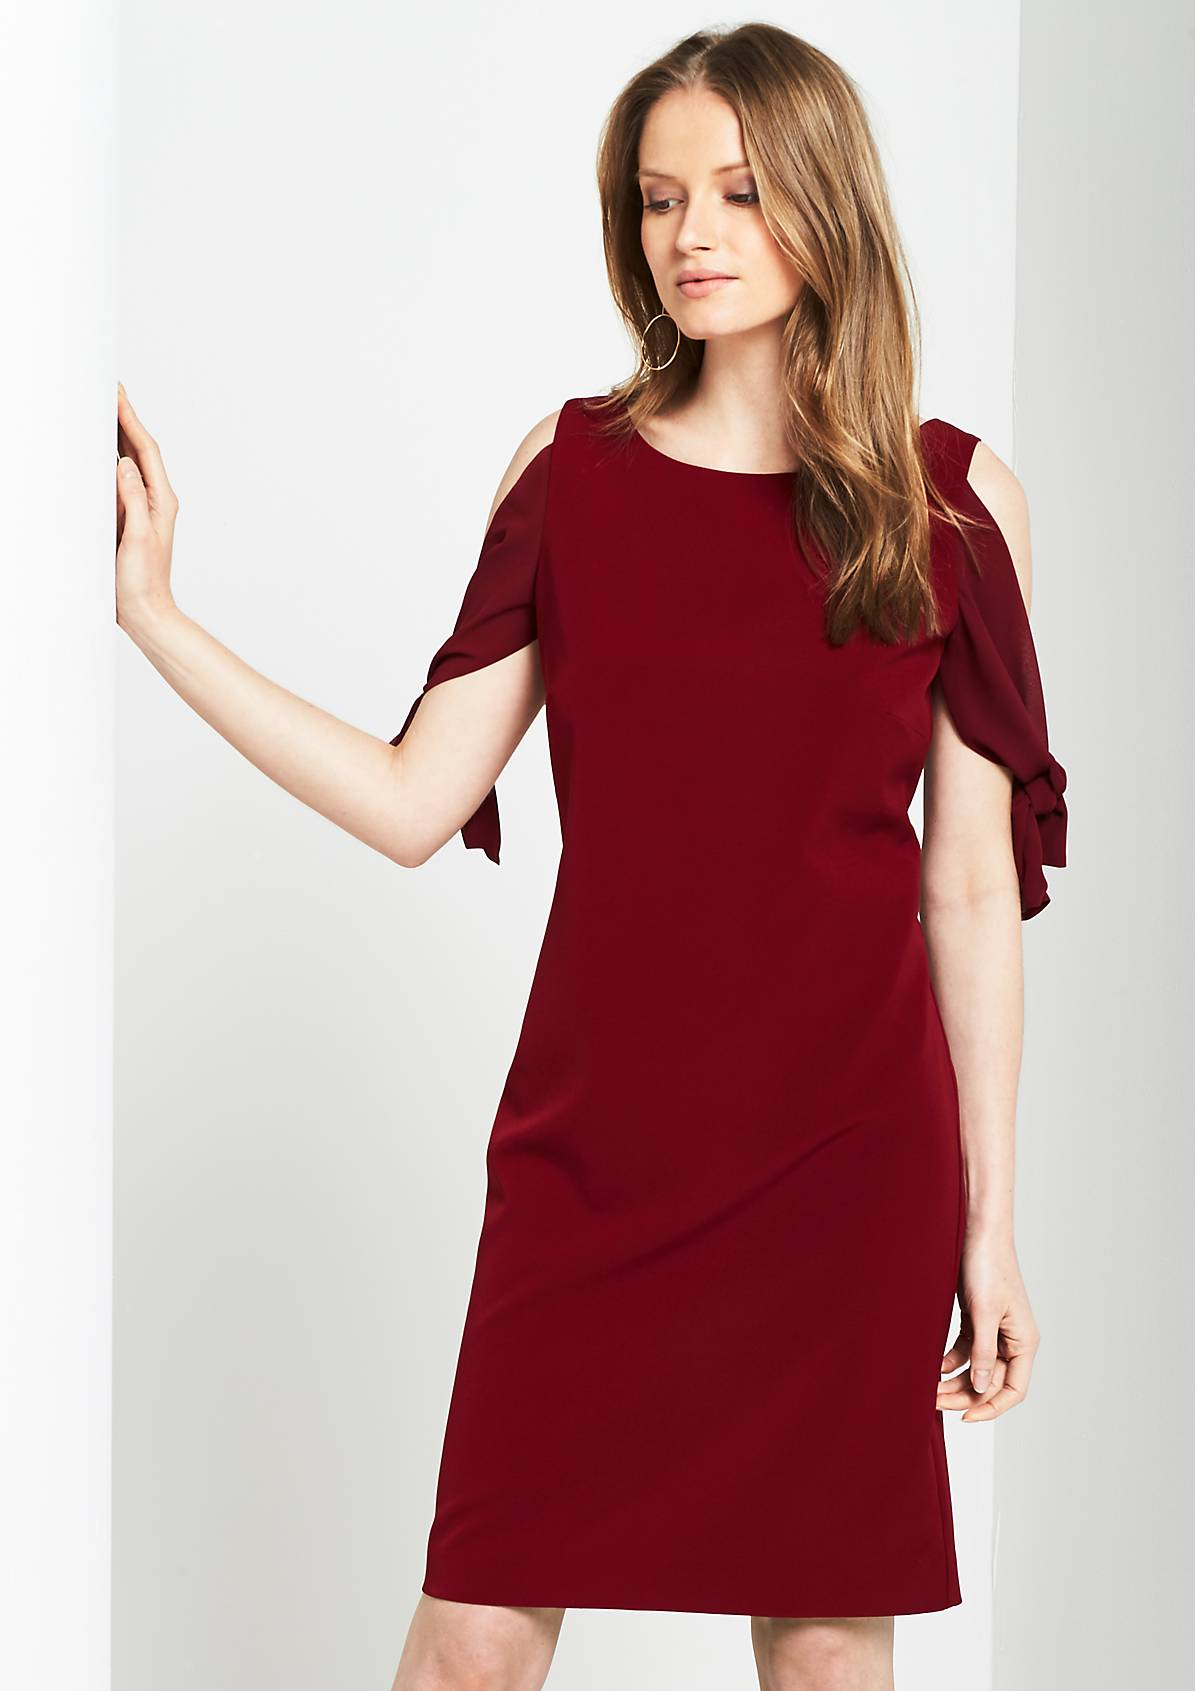 8T.704.82.3867 Abendkleid | Fashion & Mode | comma Online-Store